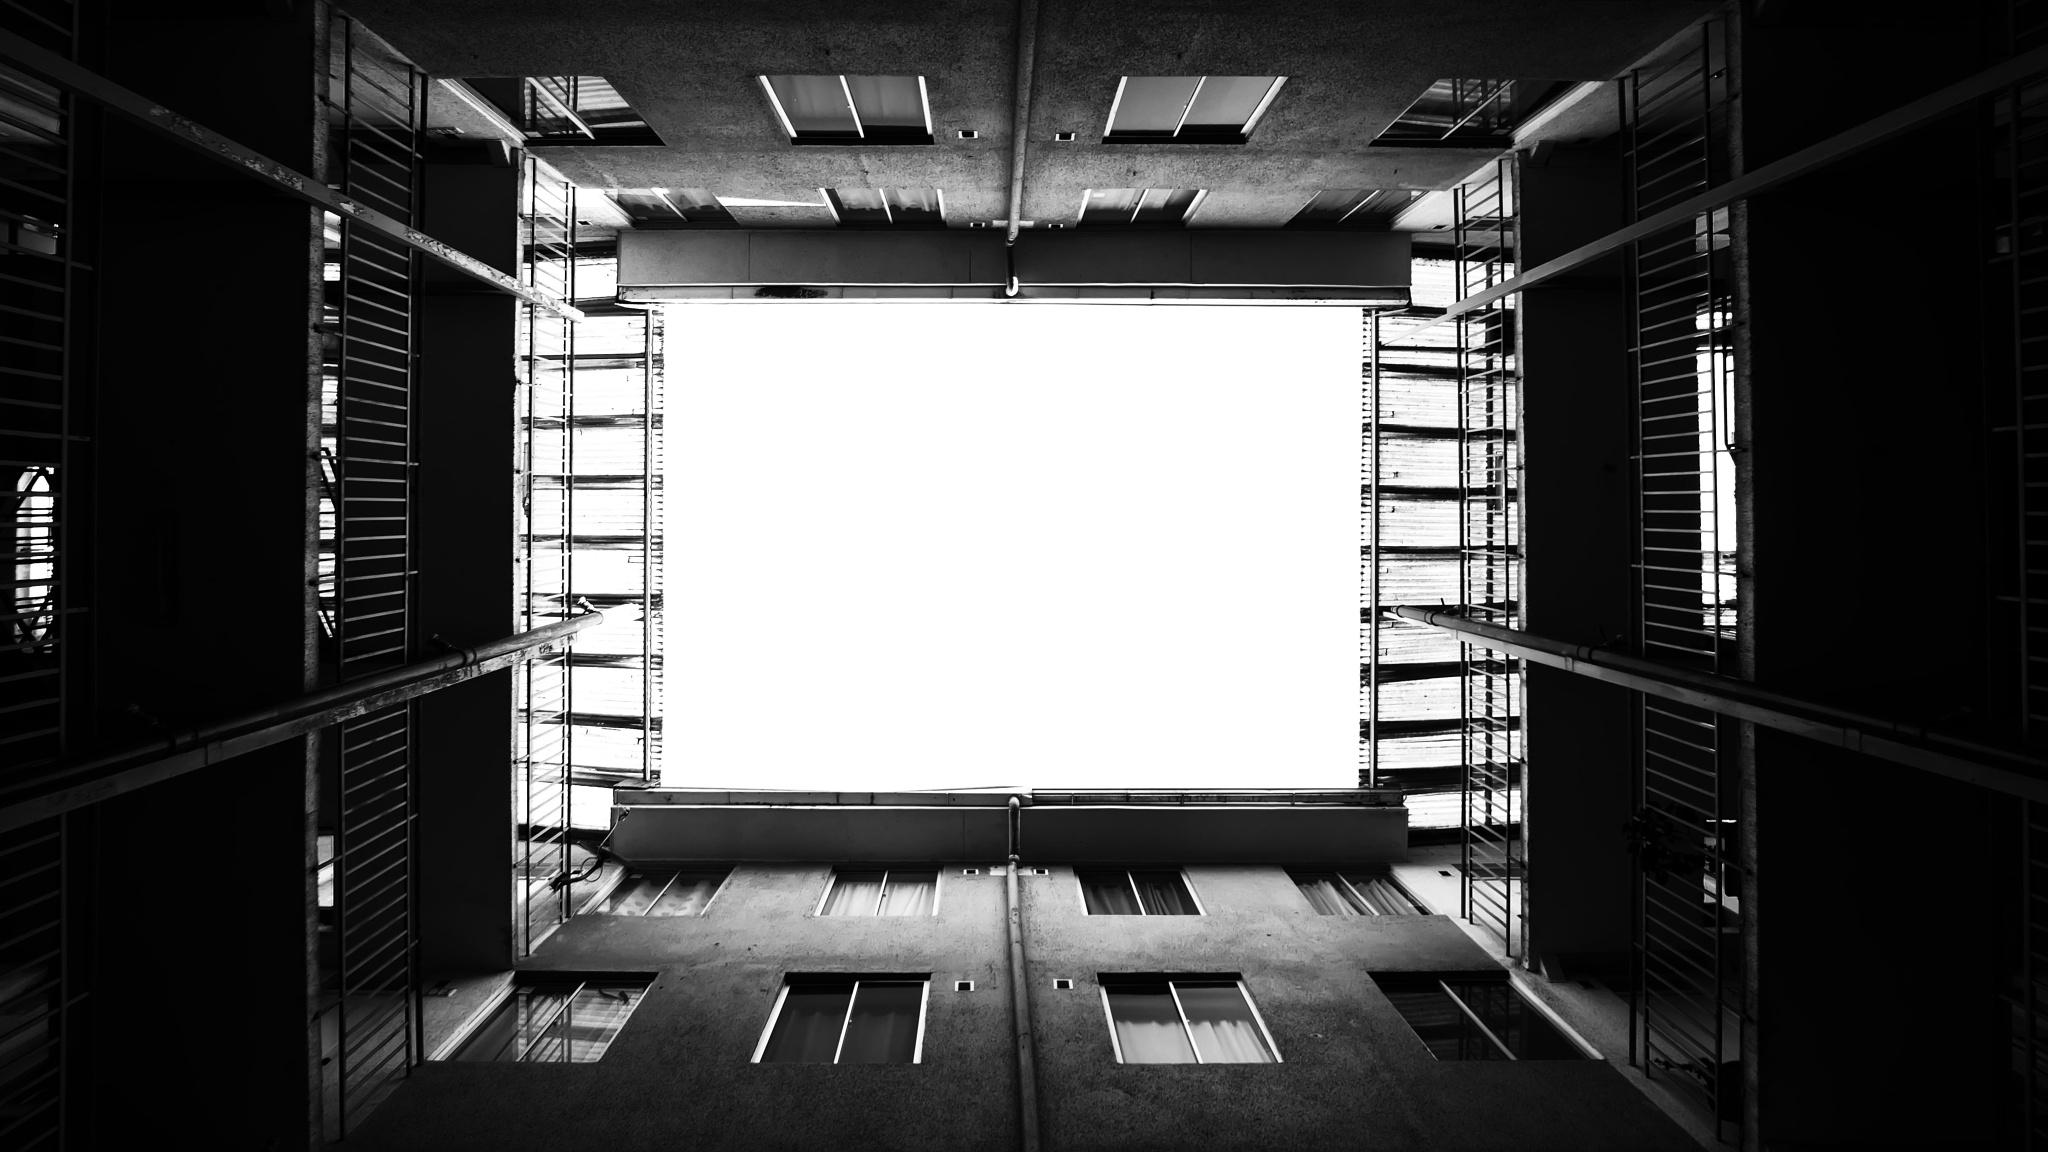 dos pisos hasta la luz by cristian.negrus